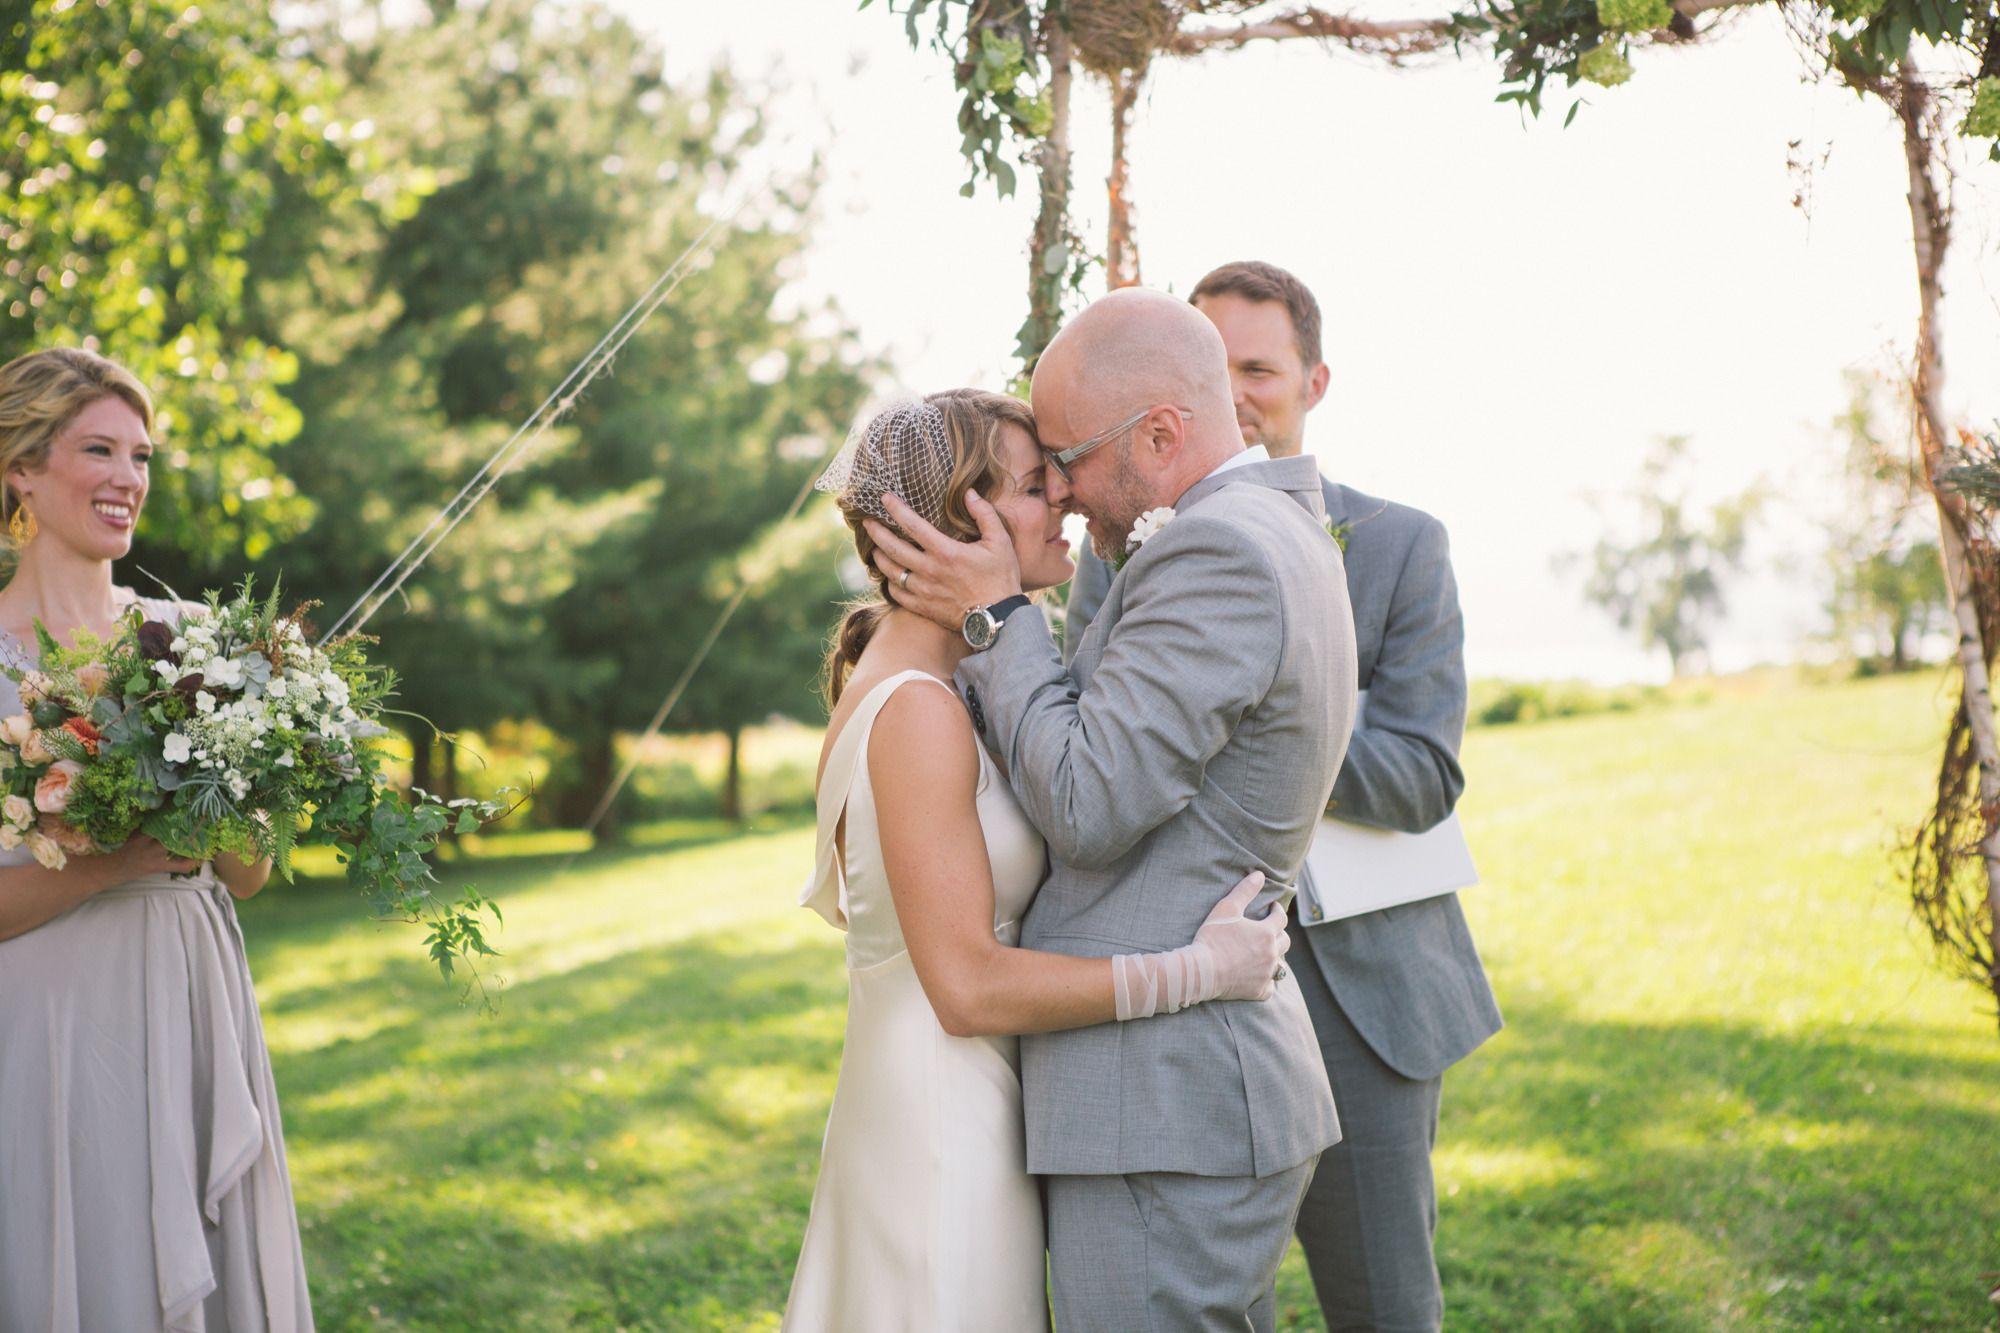 I do | Finger Lakes Barn Wedding from Alexandra Meseke Photography  Read more - http://www.stylemepretty.com/new-york-weddings/2013/10/23/finger-lakes-barn-wedding-from-alexandra-meseke-photography/